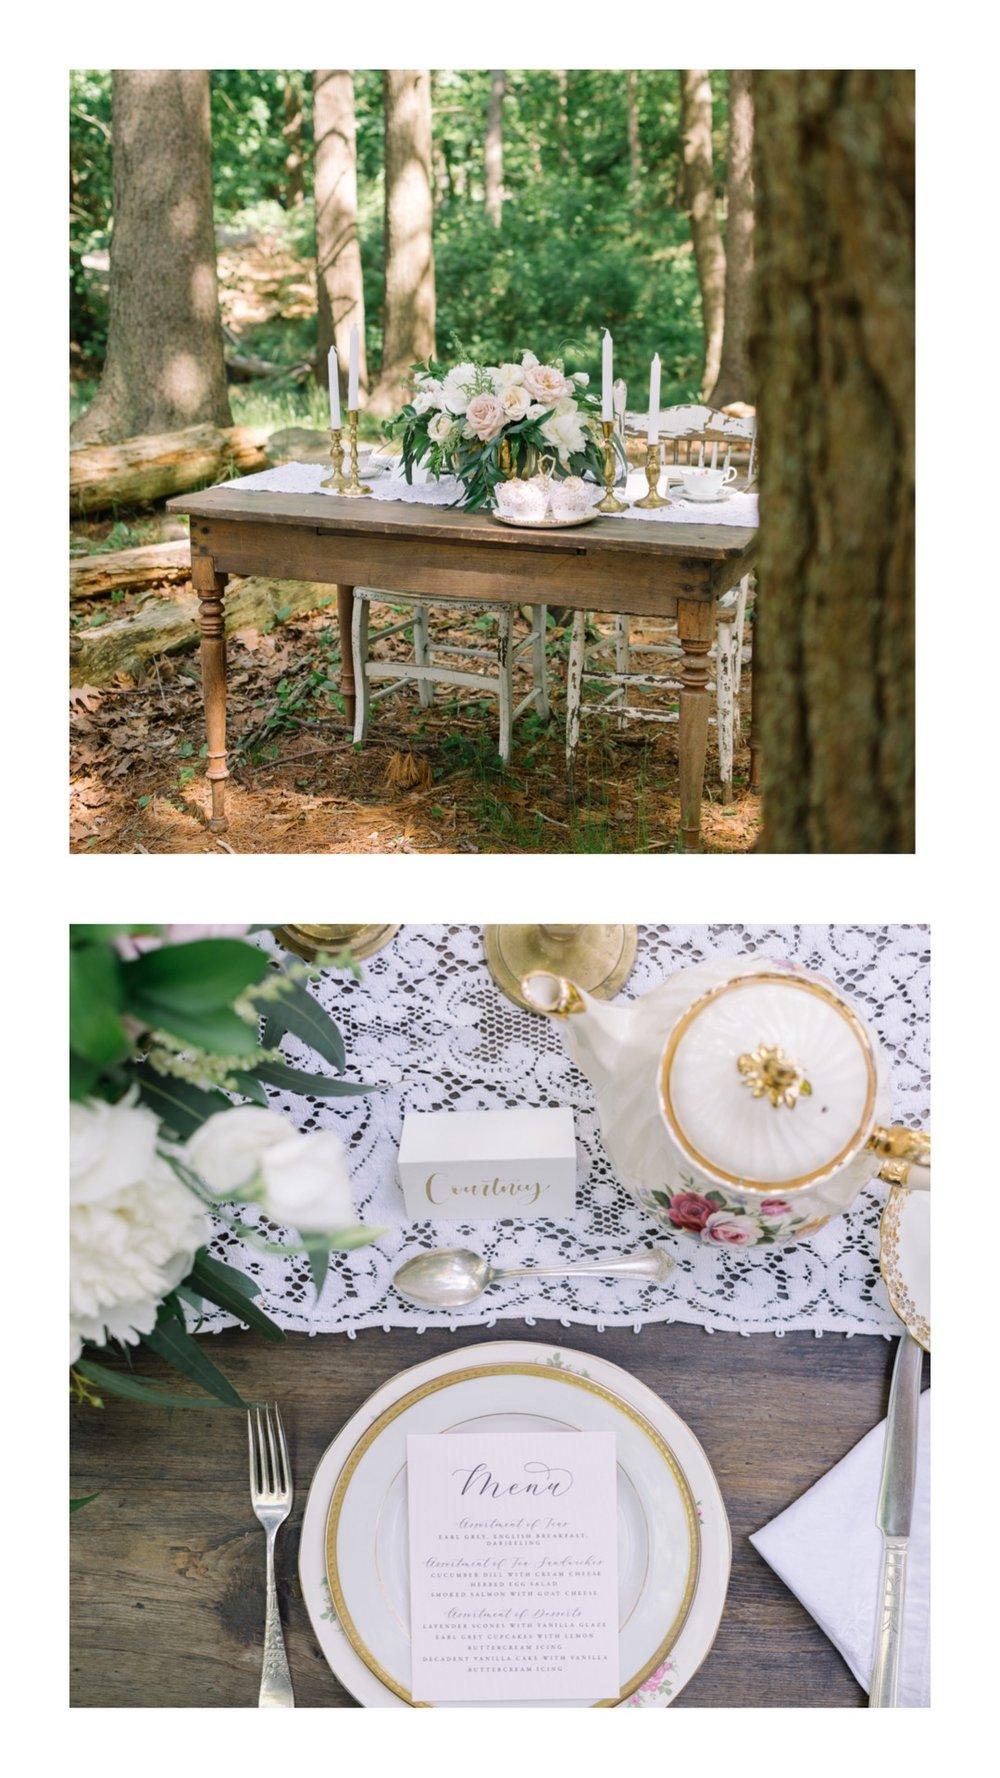 Halifax Wedding Photographer Styled Shoot - Gray Weddings & Events - Sinead Dubeau Photography